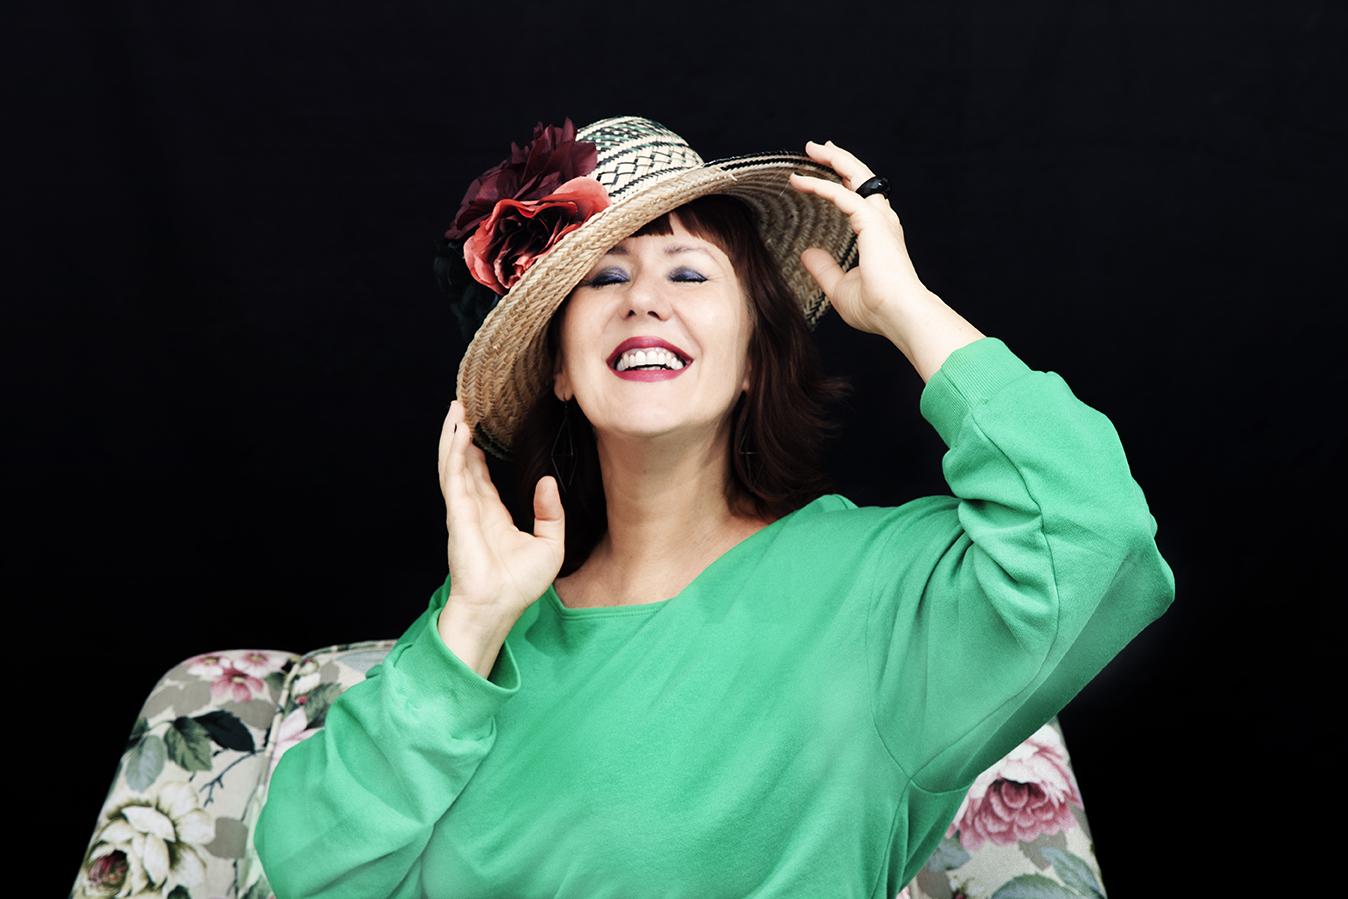 Tita Beaufrand